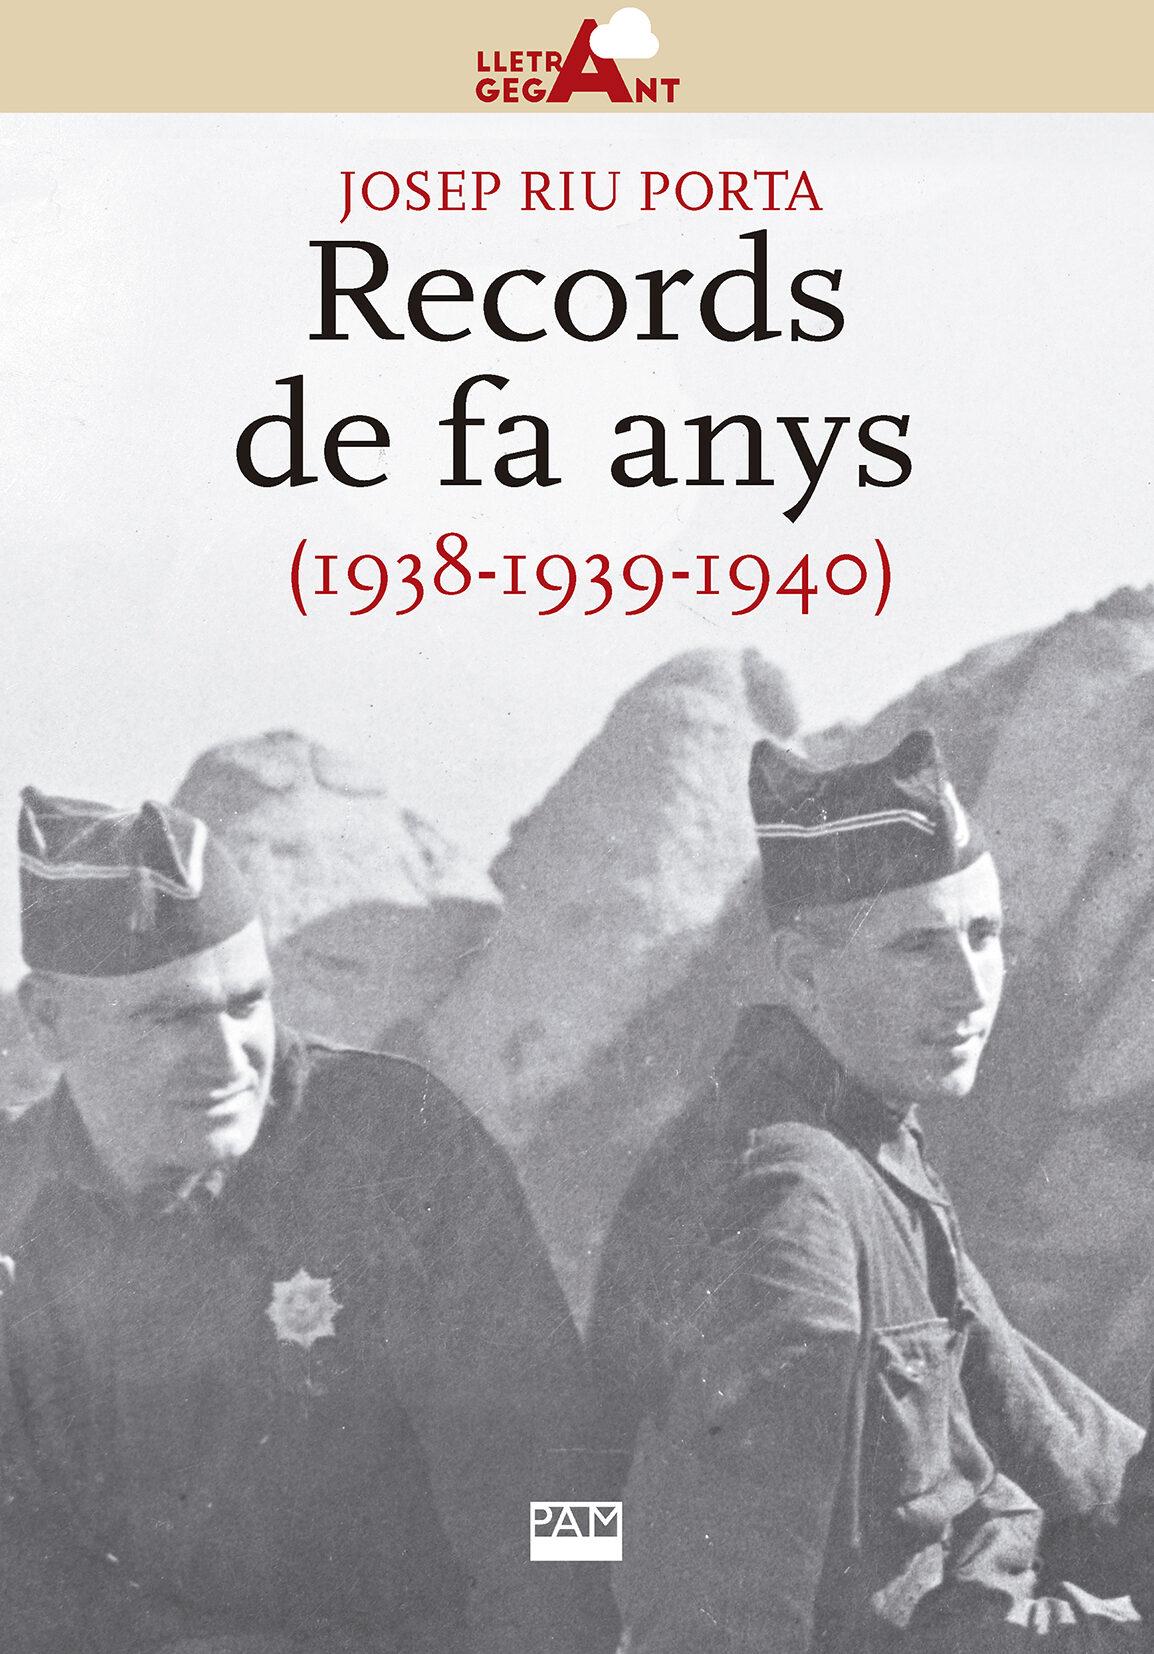 Records De Fa Anys (1938-1939-1940) - Riu Porta Josep